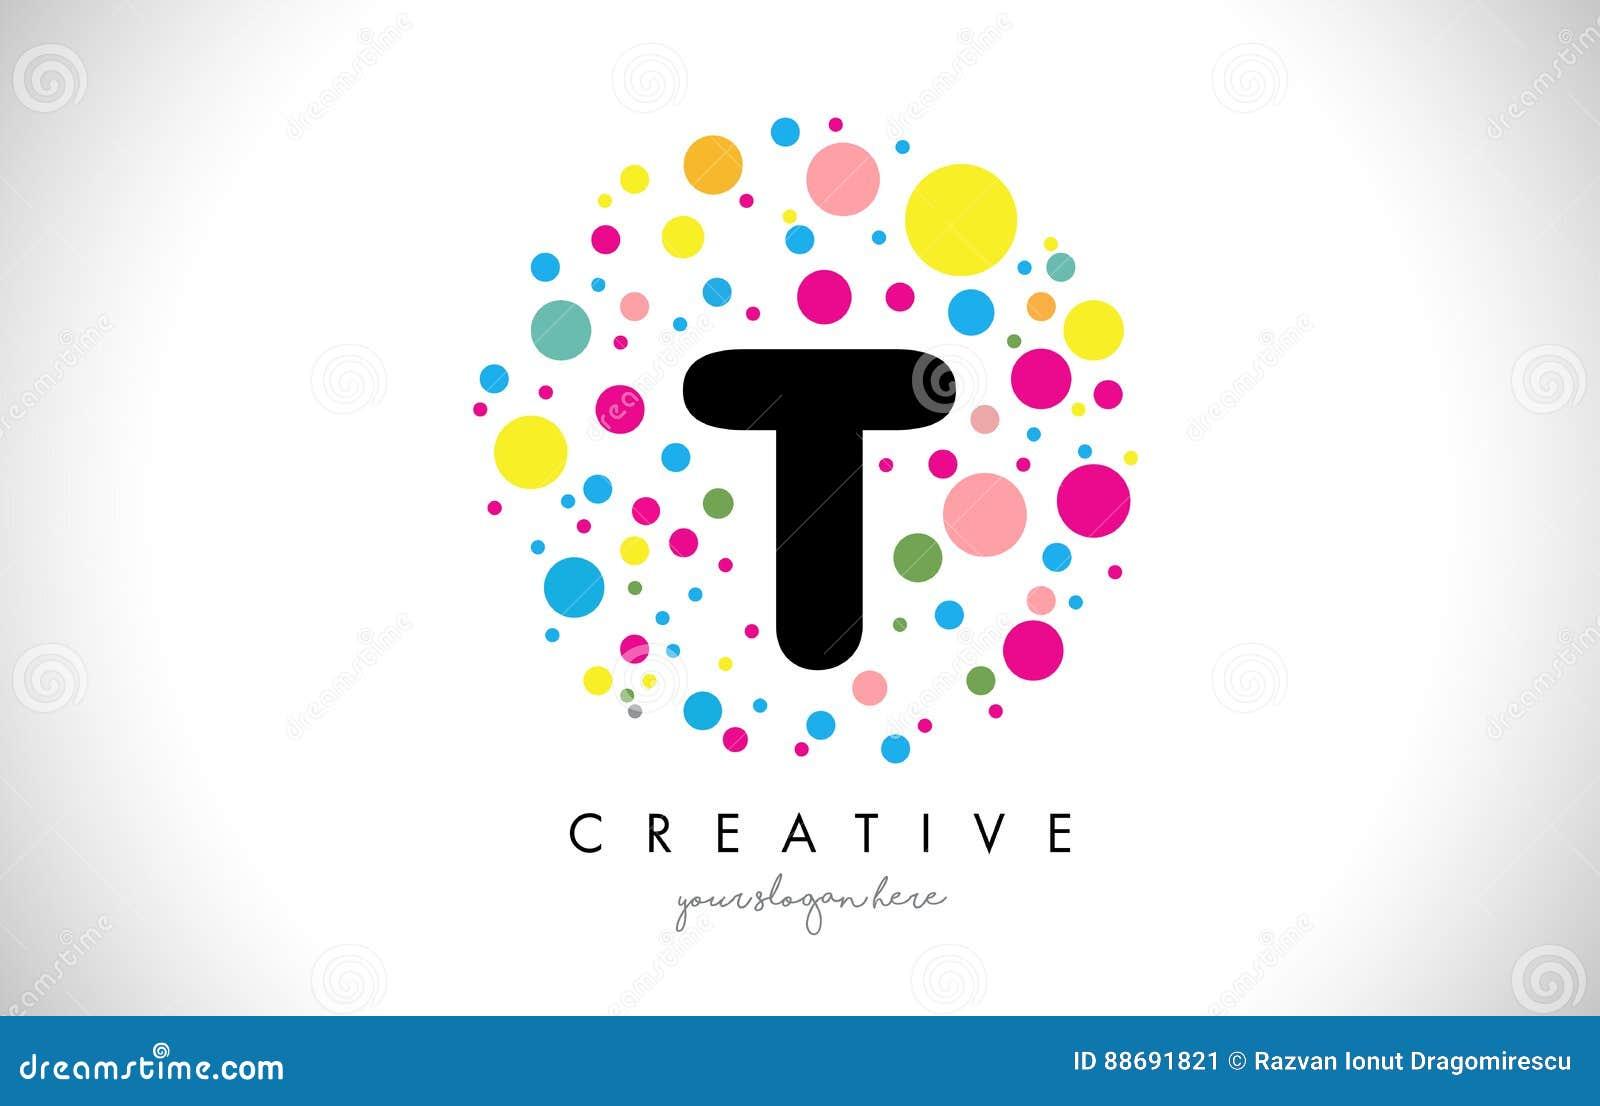 t bubble dots letter logo design with creative colorful bubbles